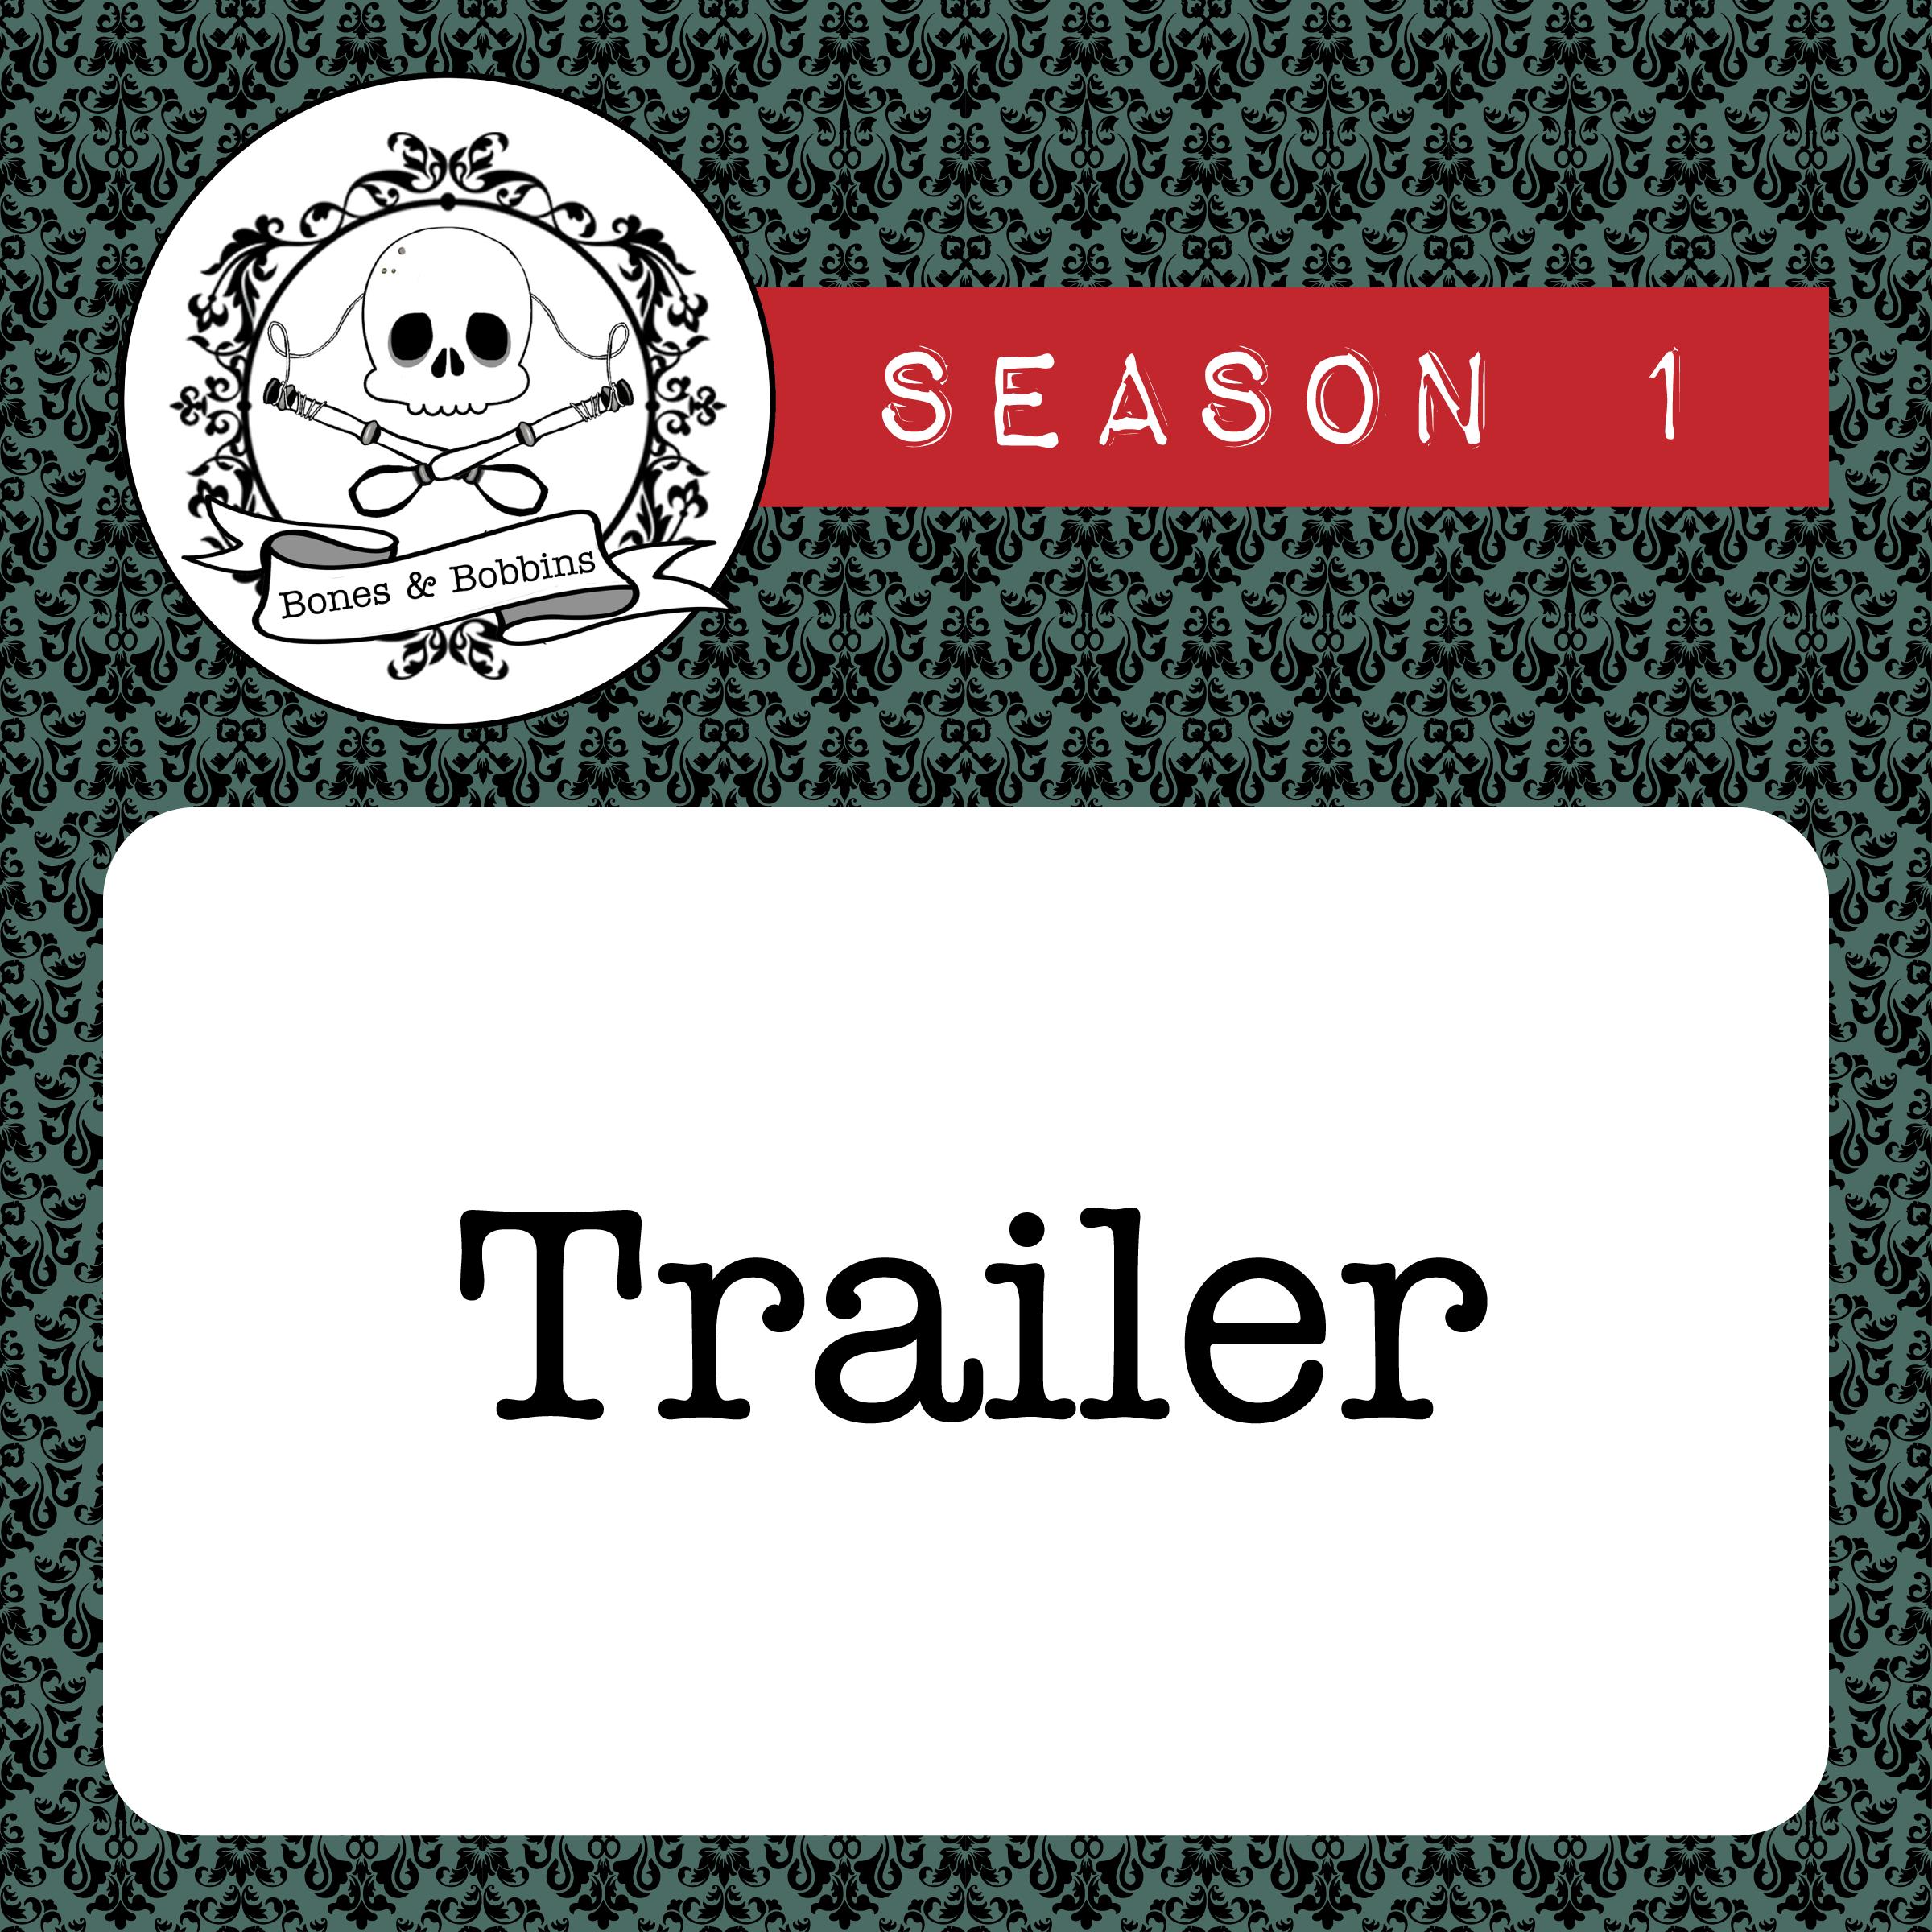 The Bones & Bobbins Podcast, Season 1: Trailer